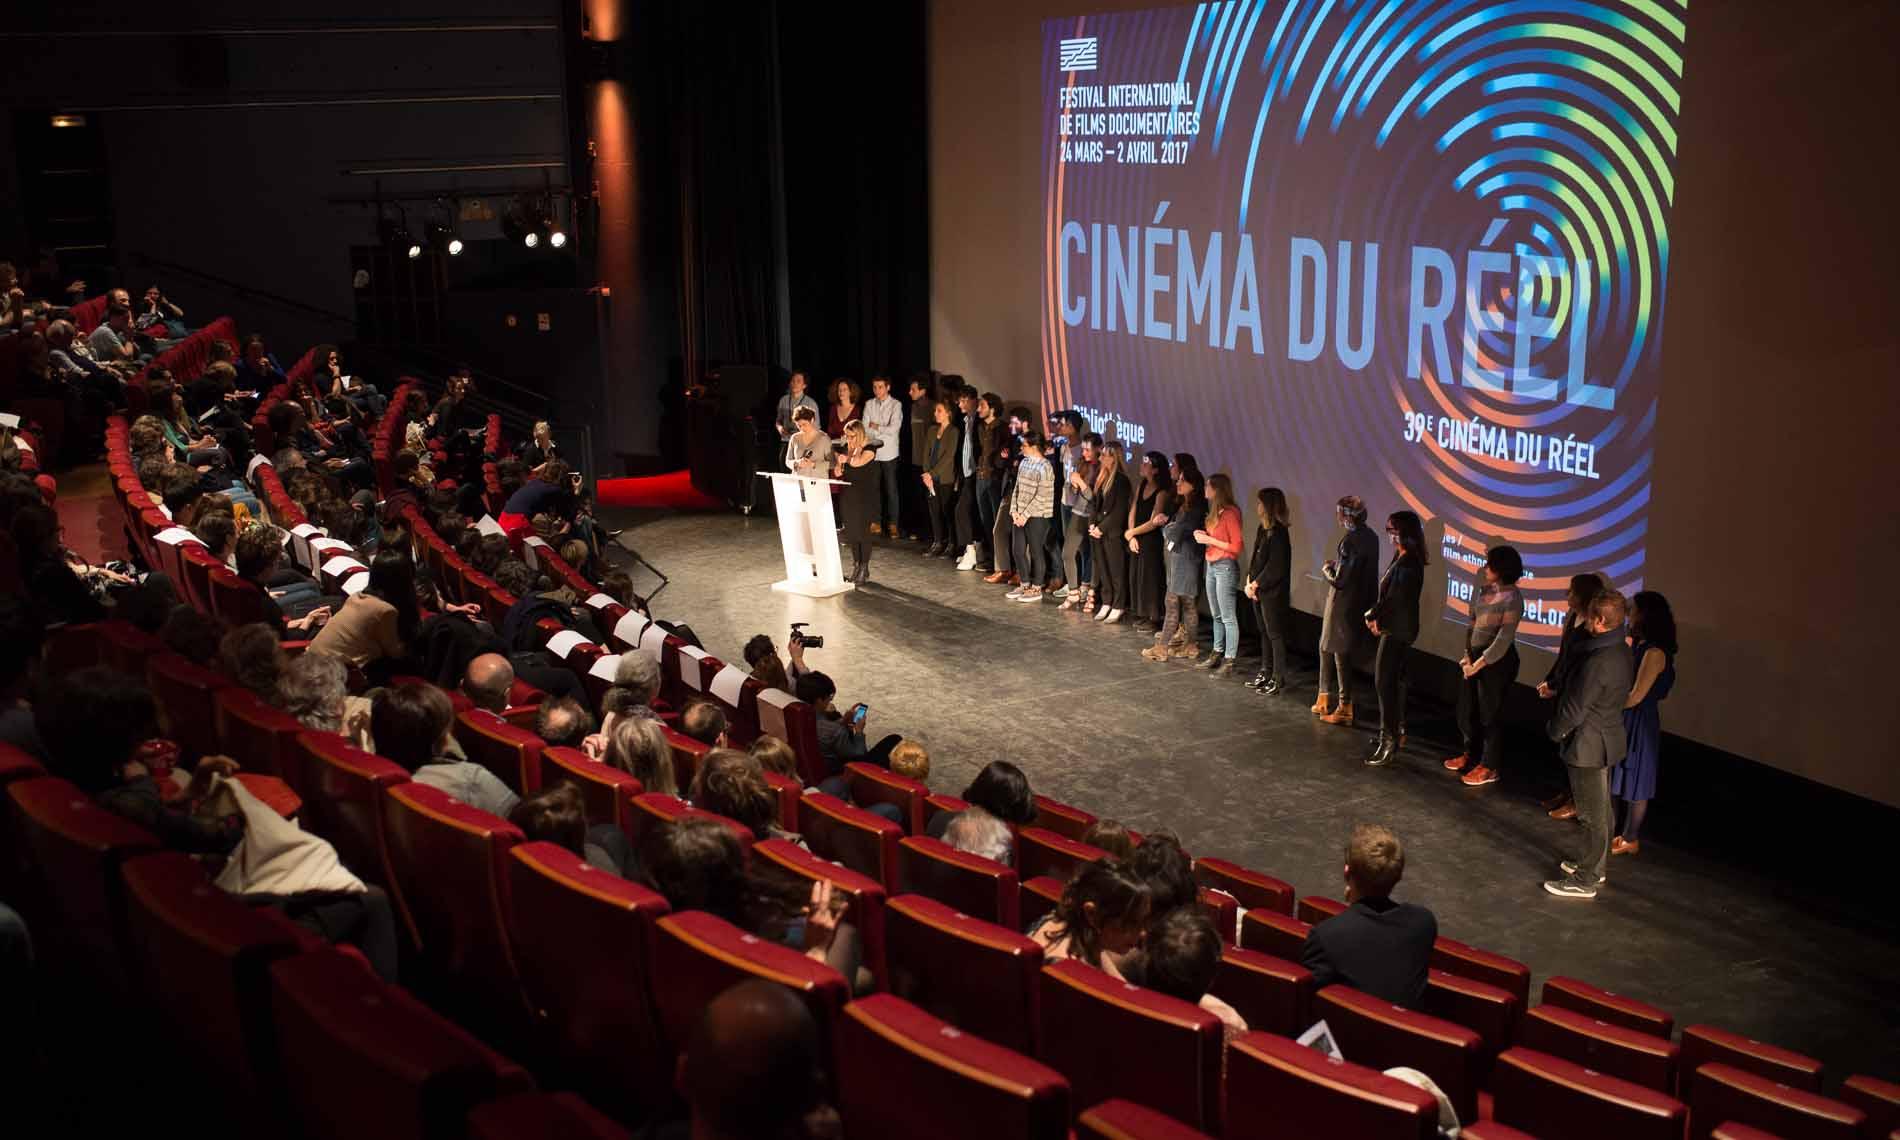 Filmmakers present their film at the Cinema Du Reel Film Festival